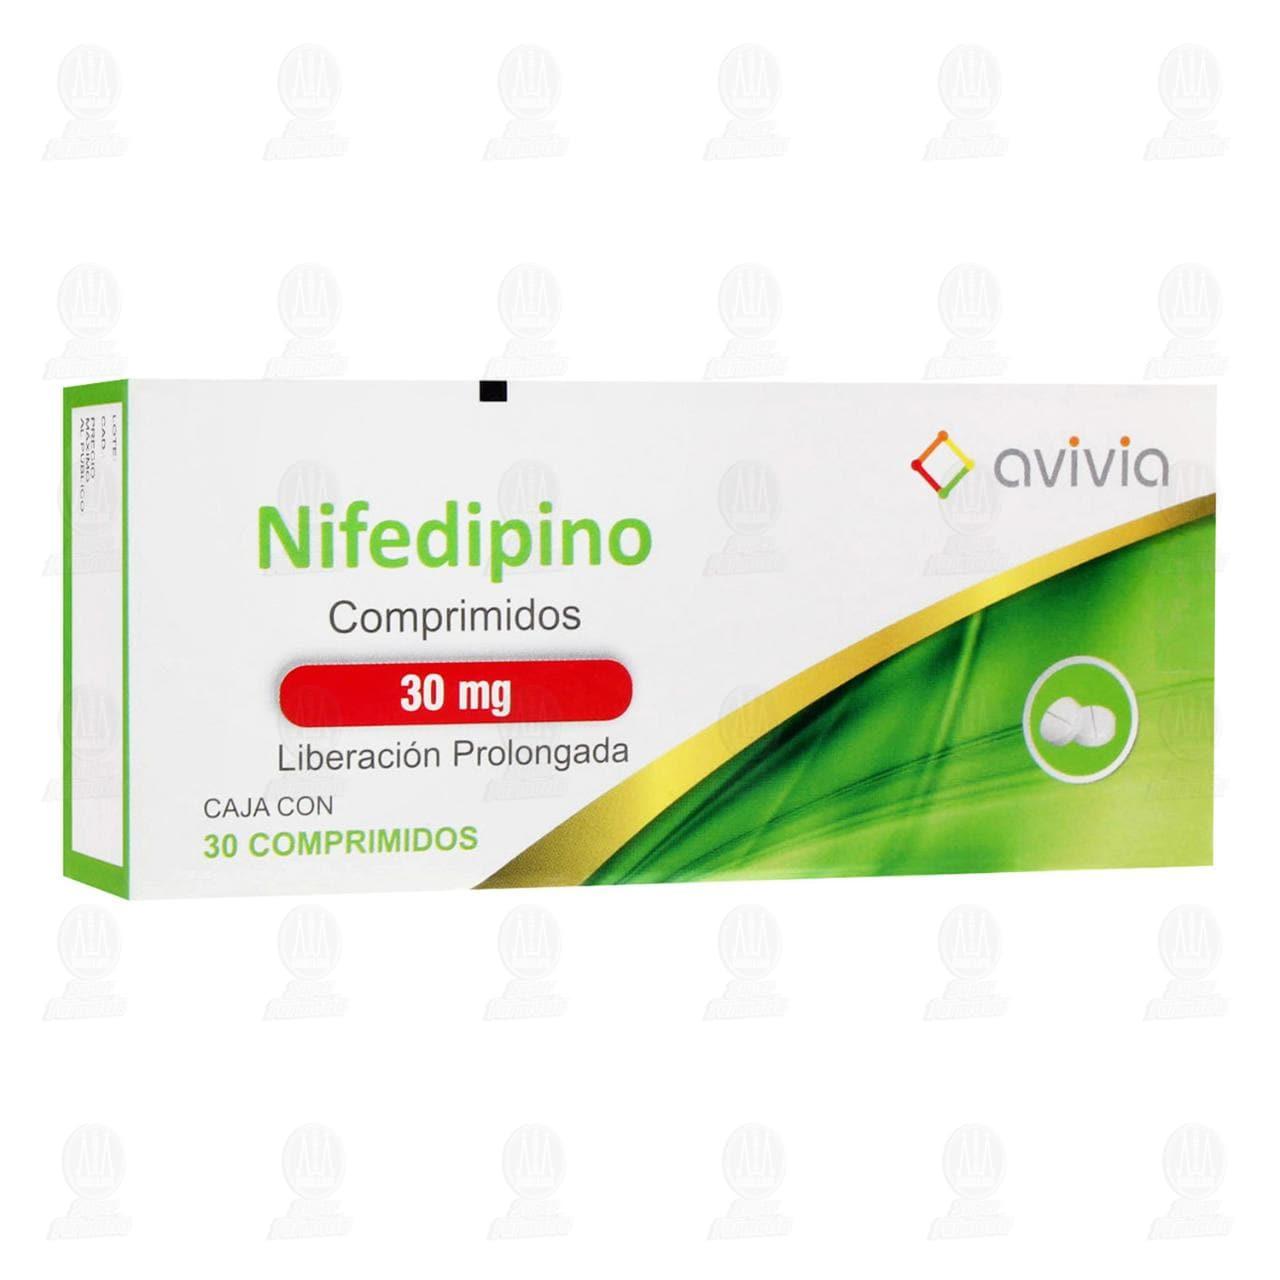 Comprar Nifedipino 30mg 30 Comprimidos Avivia Pharma en Farmacias Guadalajara